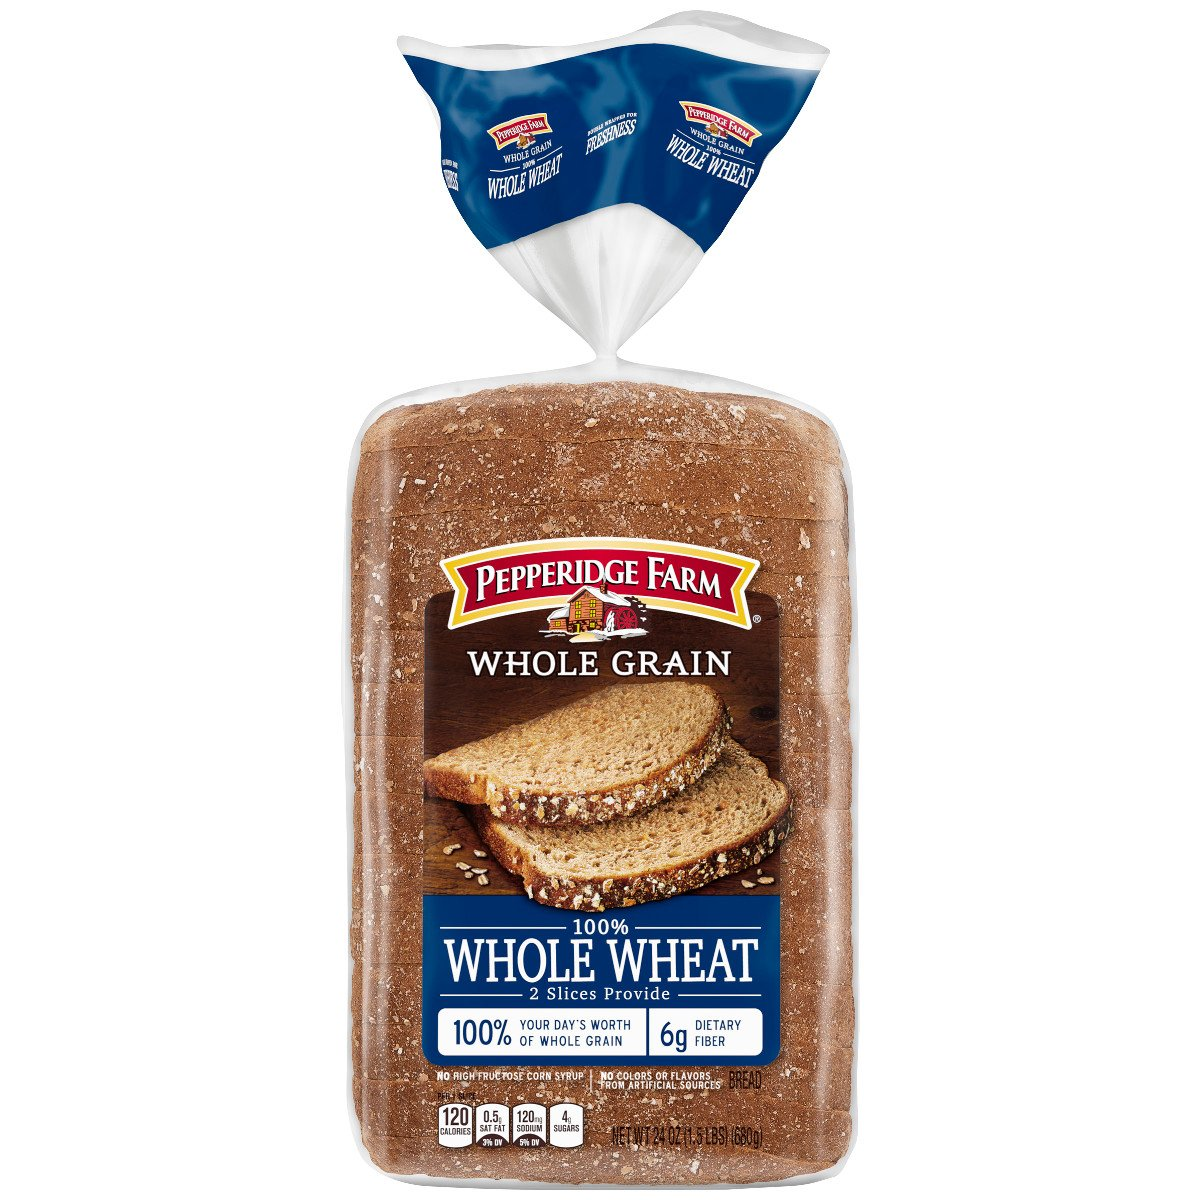 Pepperidge Farm Whole Grain 100% Whole Wheat Bread, 24 oz. Bag: Amazon.com:  Grocery & Gourmet Food